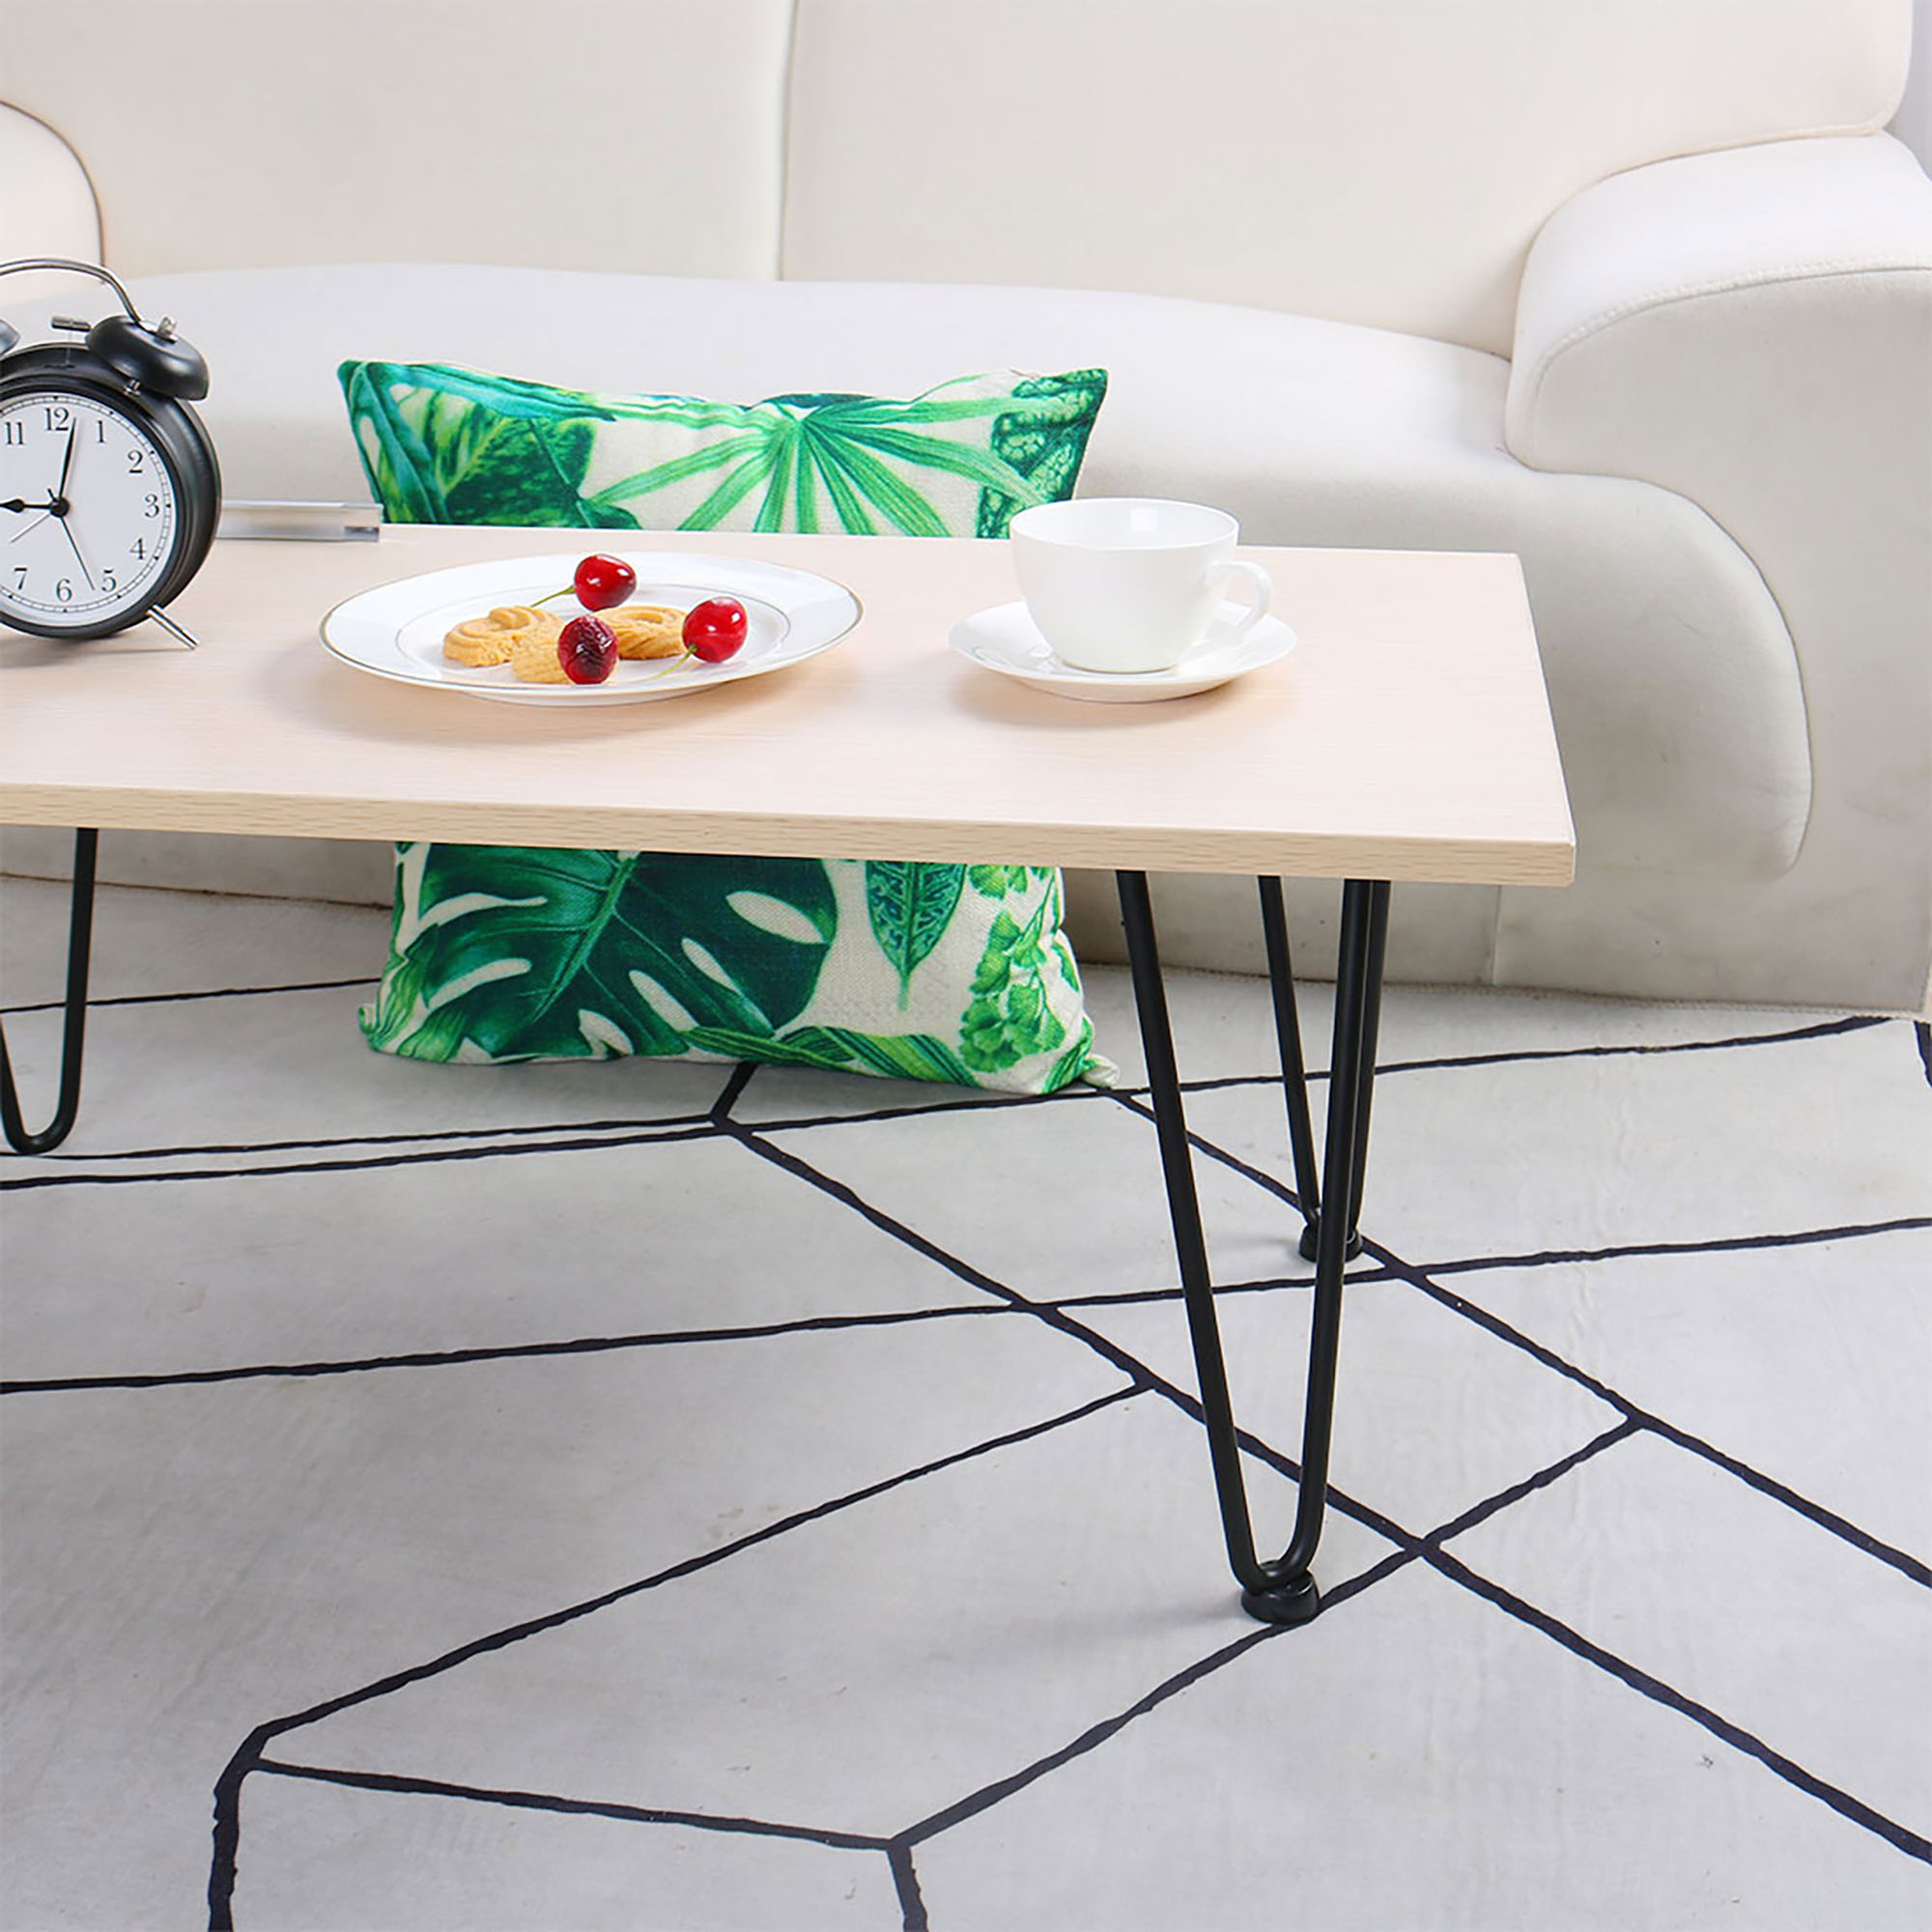 13 8 hairpin table legs coffee legs